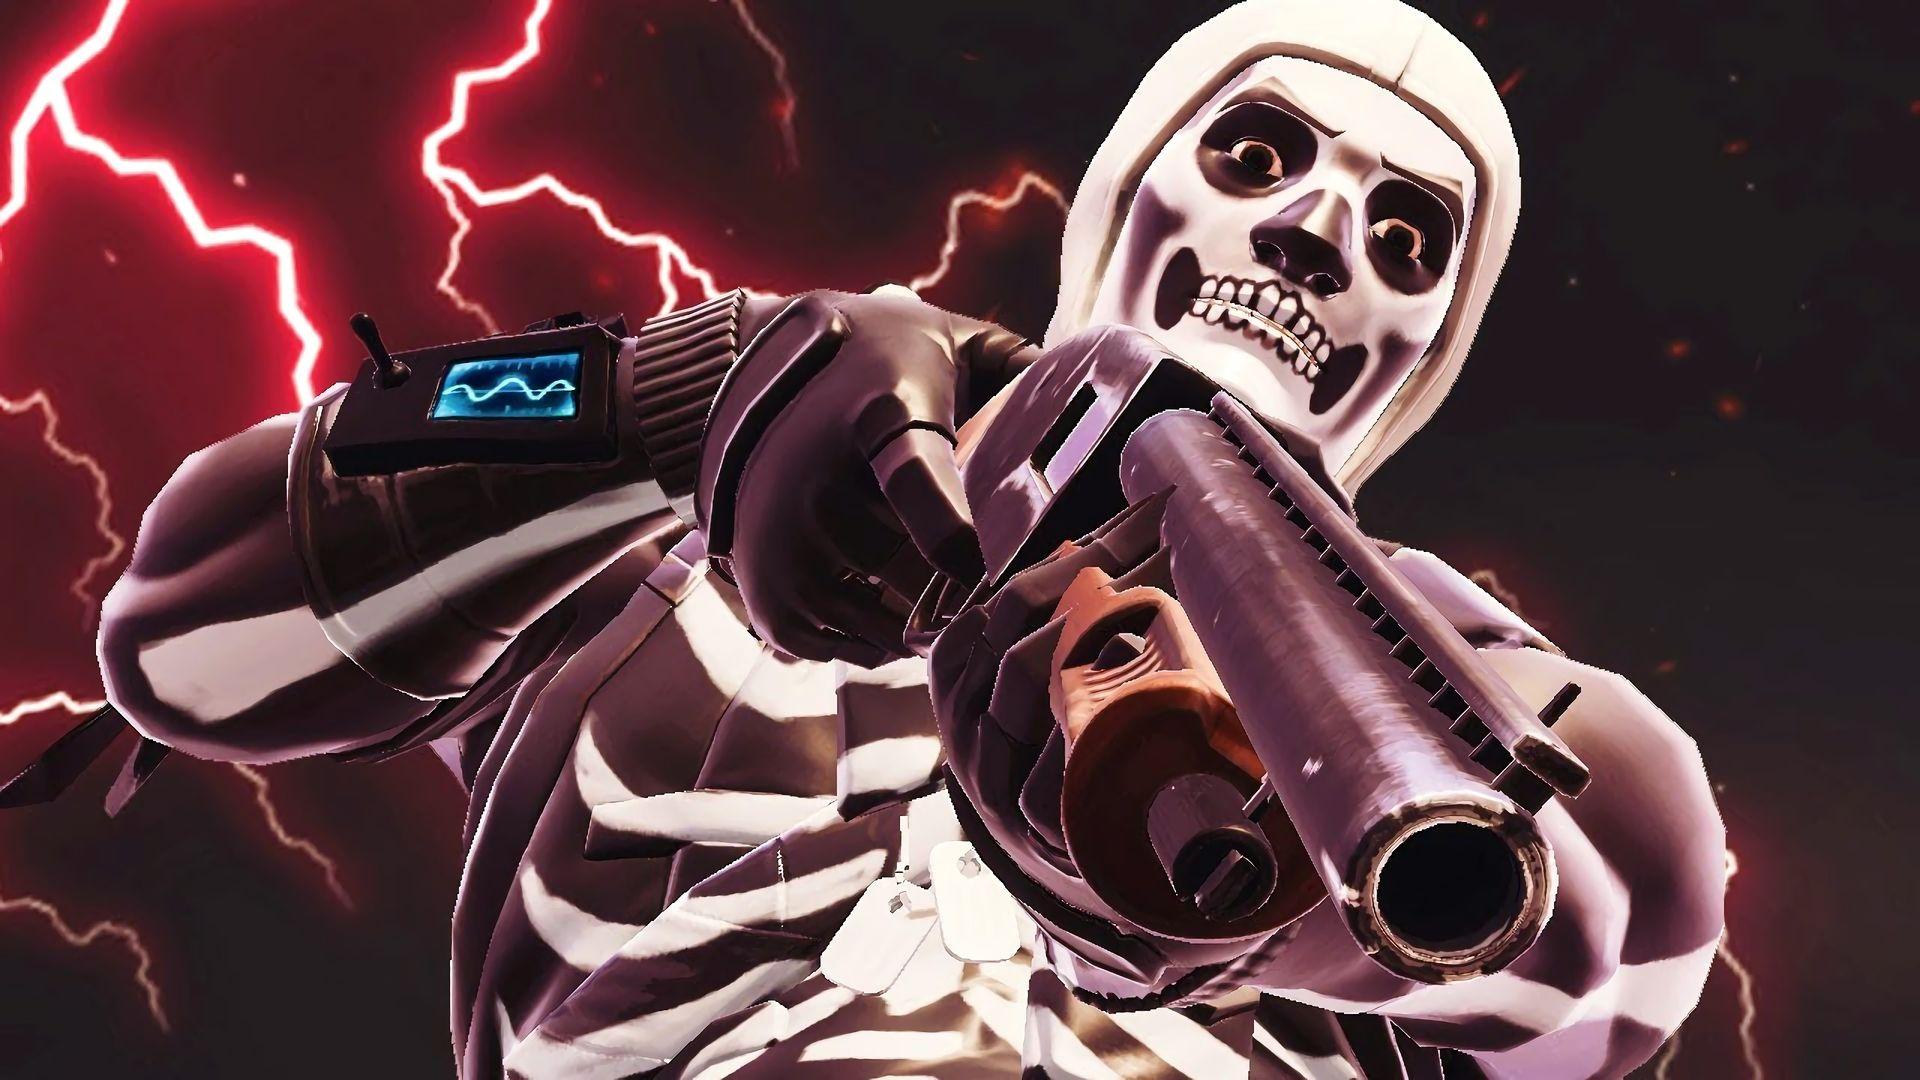 1920x1080 HD Wallpaper of Fortnite Battle Royale Video Game Skull 1920x1080